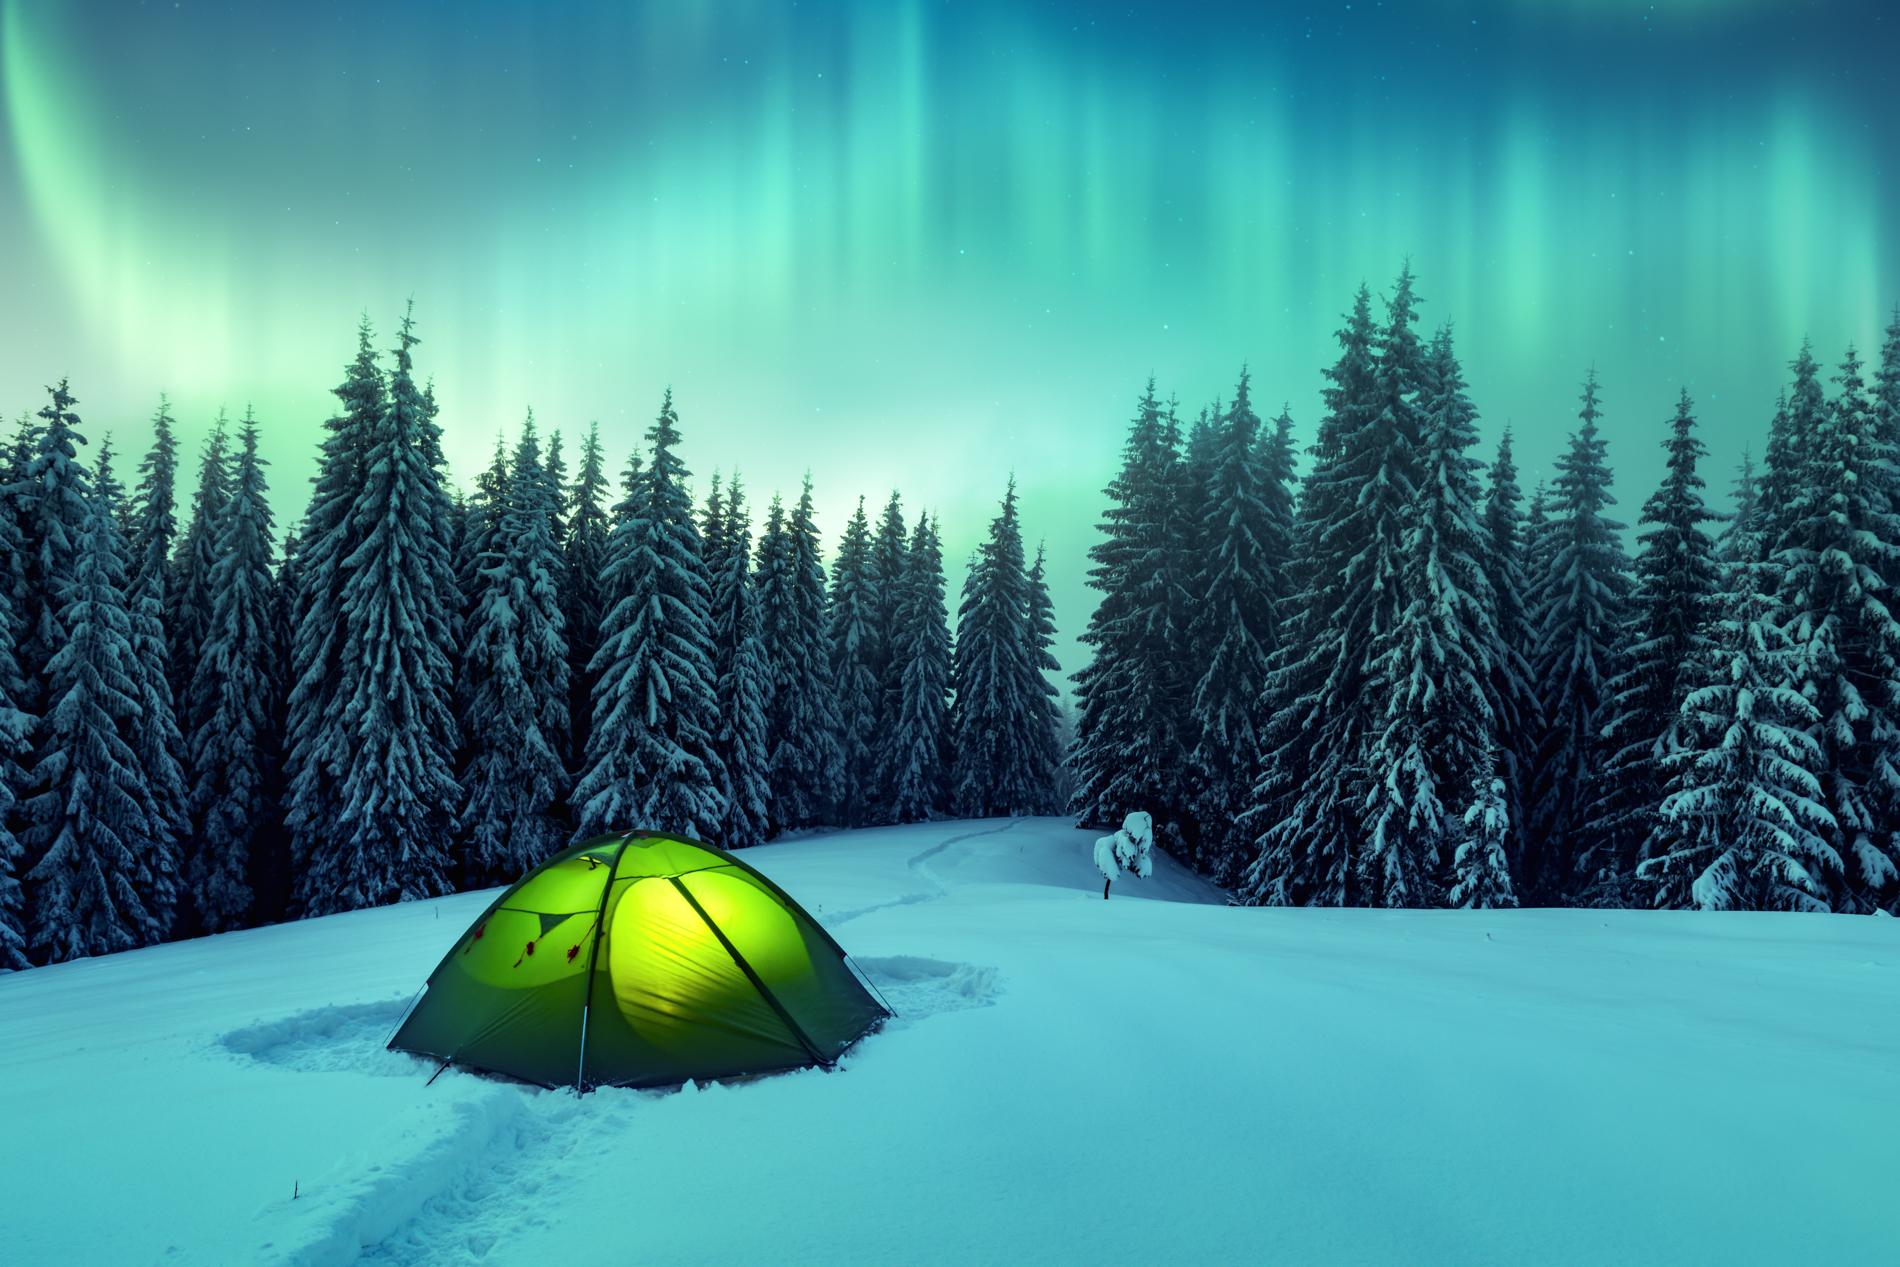 northern-lights-in-winter-forest-EGAU725.jpg